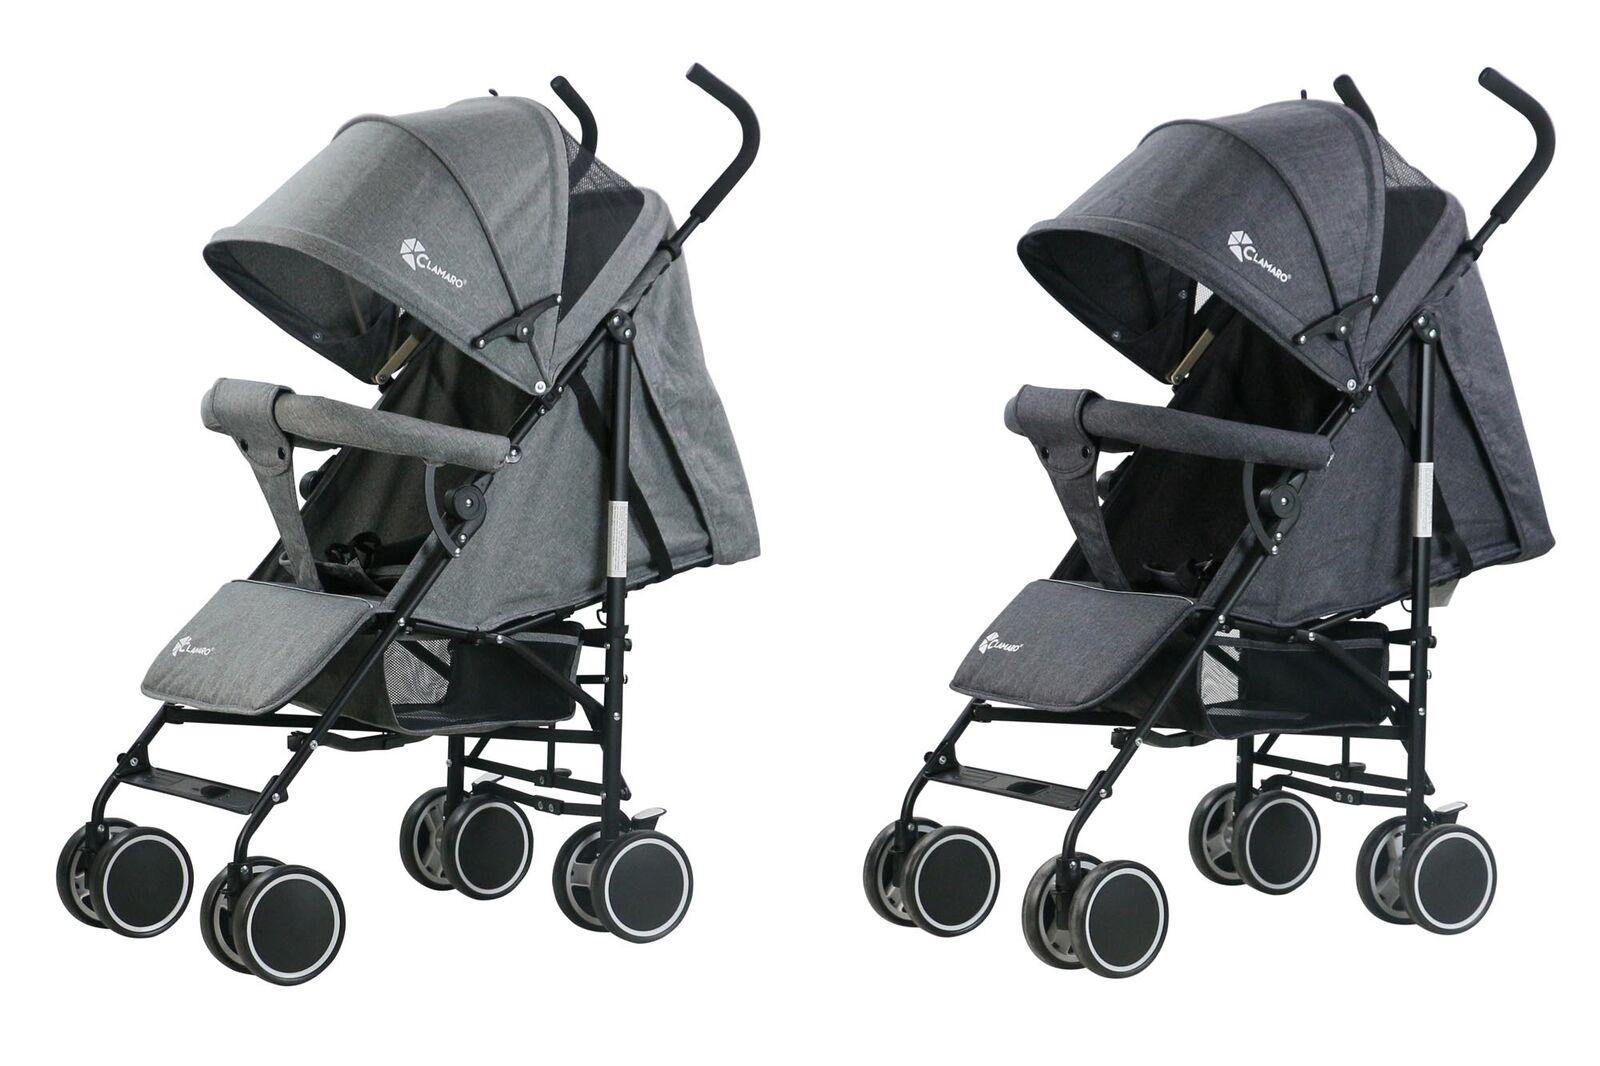 Buggy Kinderbuggy Kinderwagen Kindersportwagen Baby Sport Clamaro Balu bis 25Kg